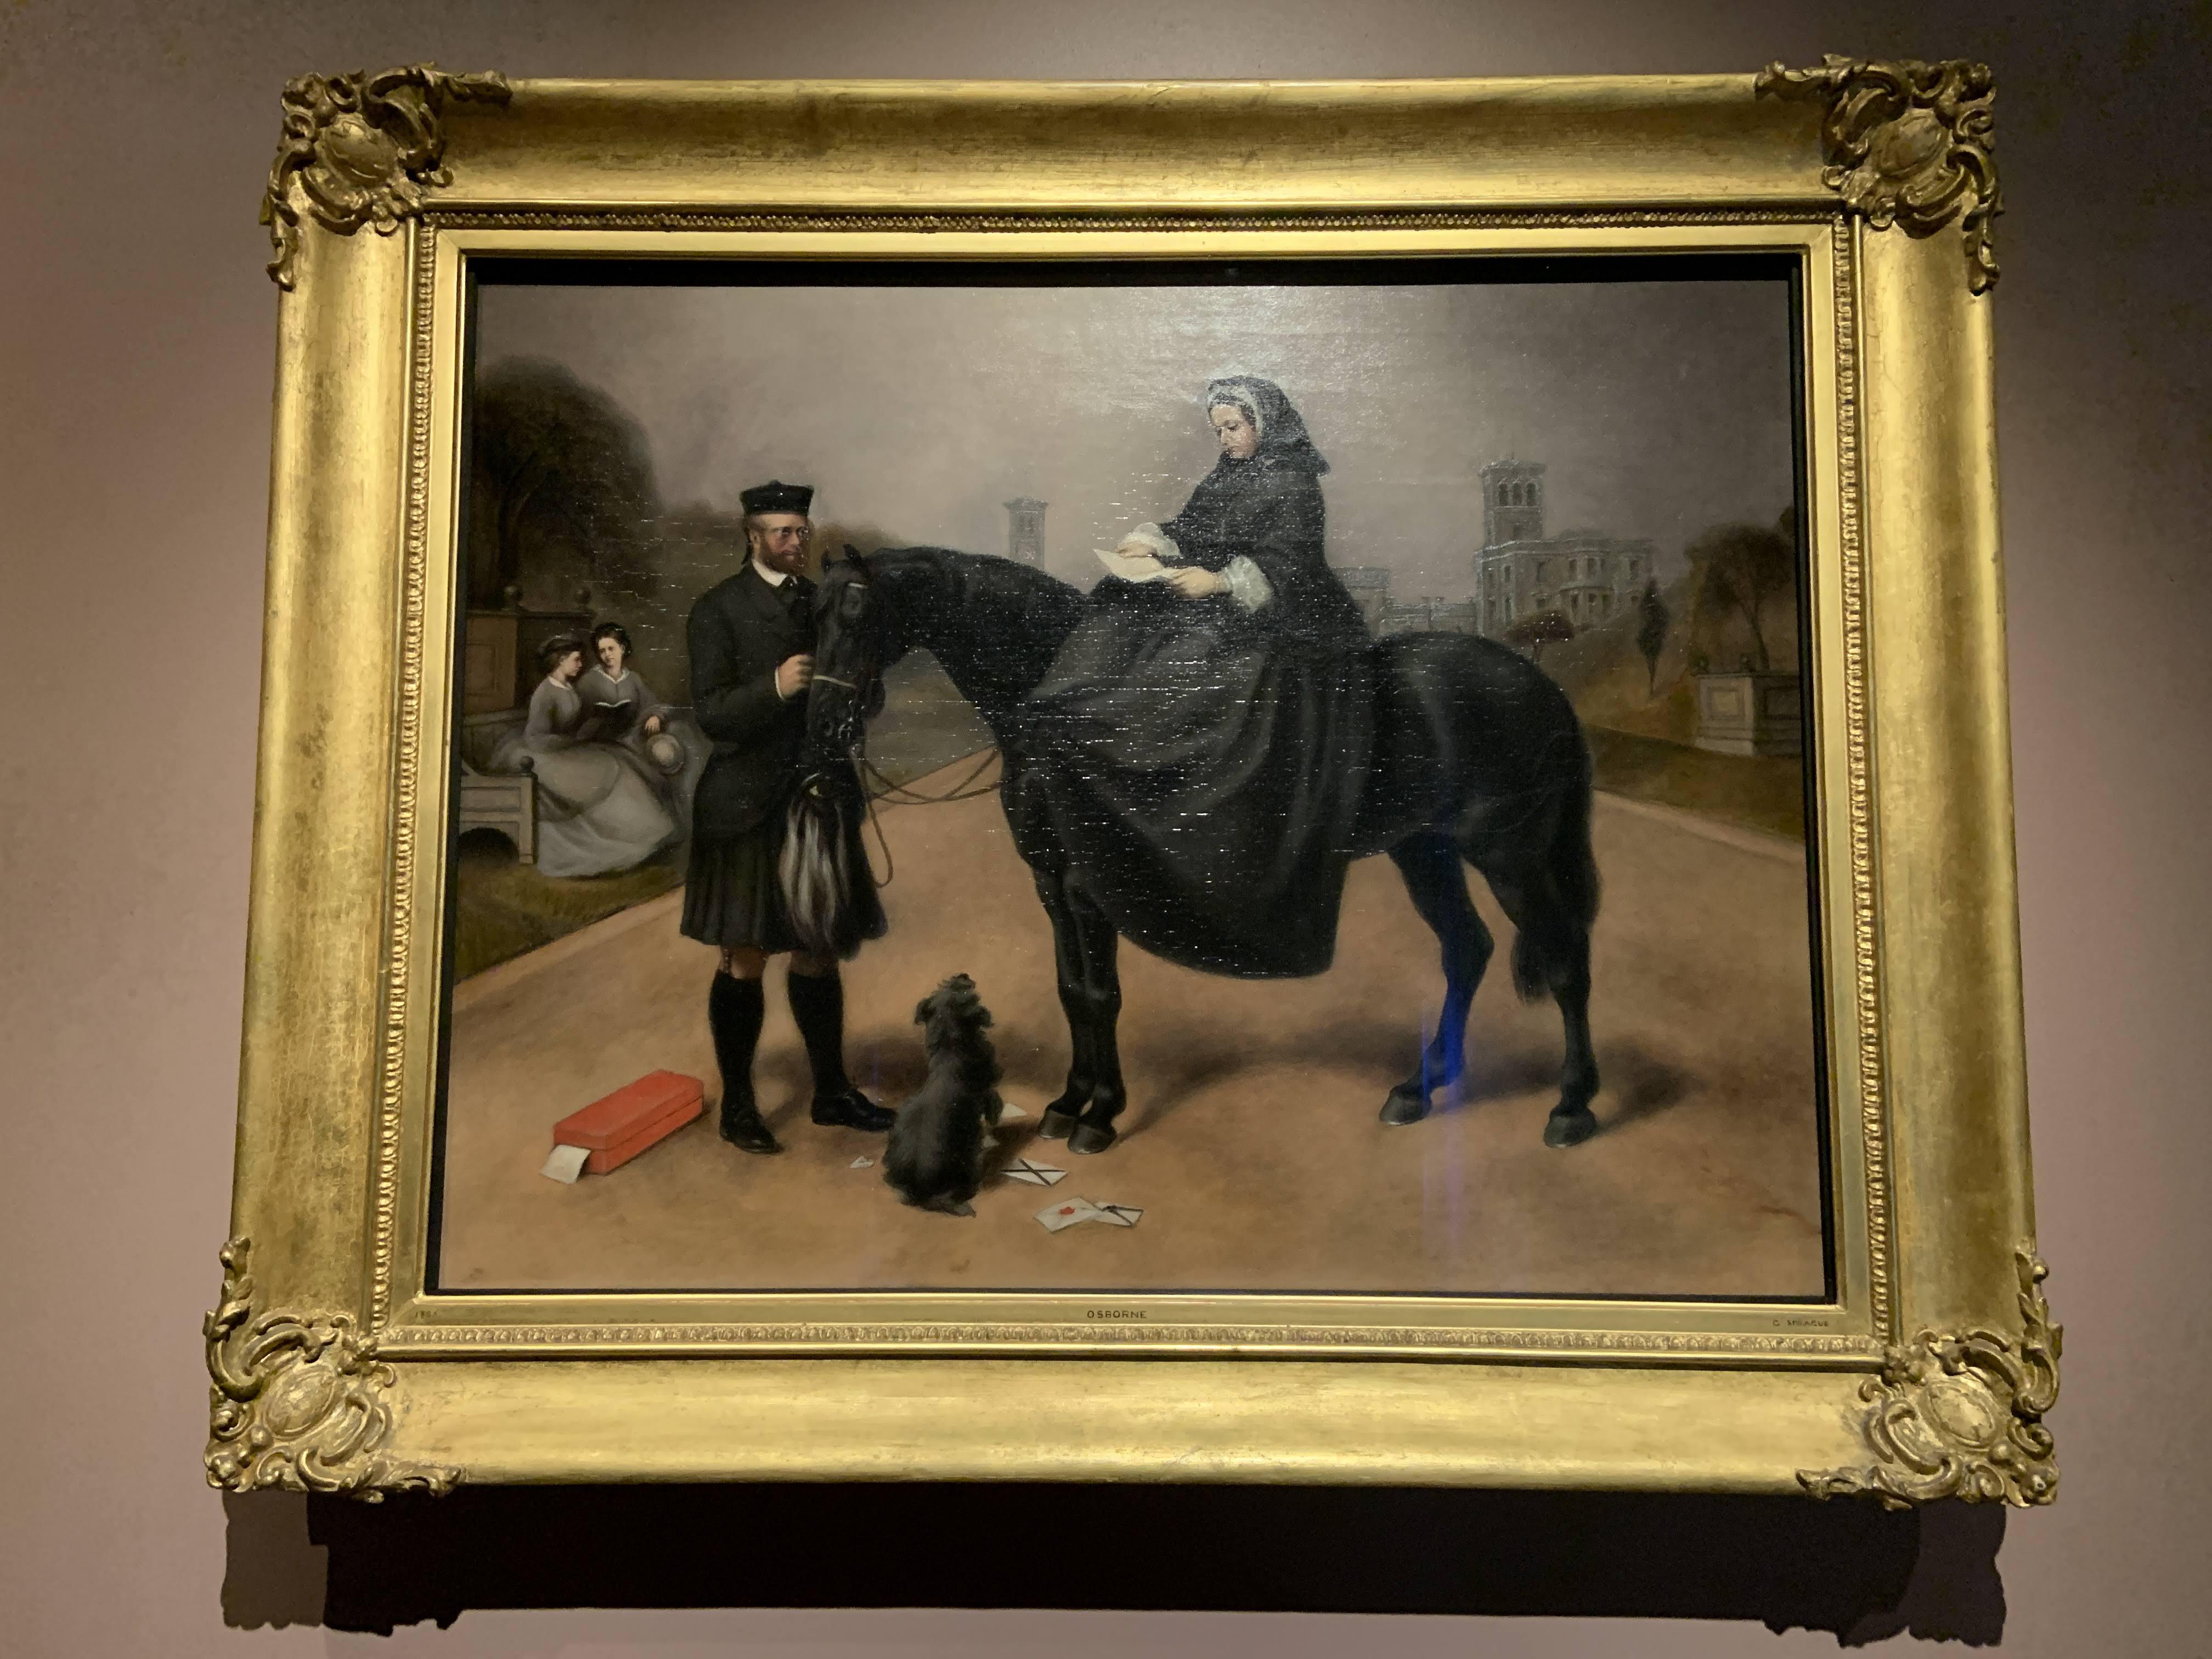 Queen Victoria at Osborne by Gilbert Sprague after Landseer